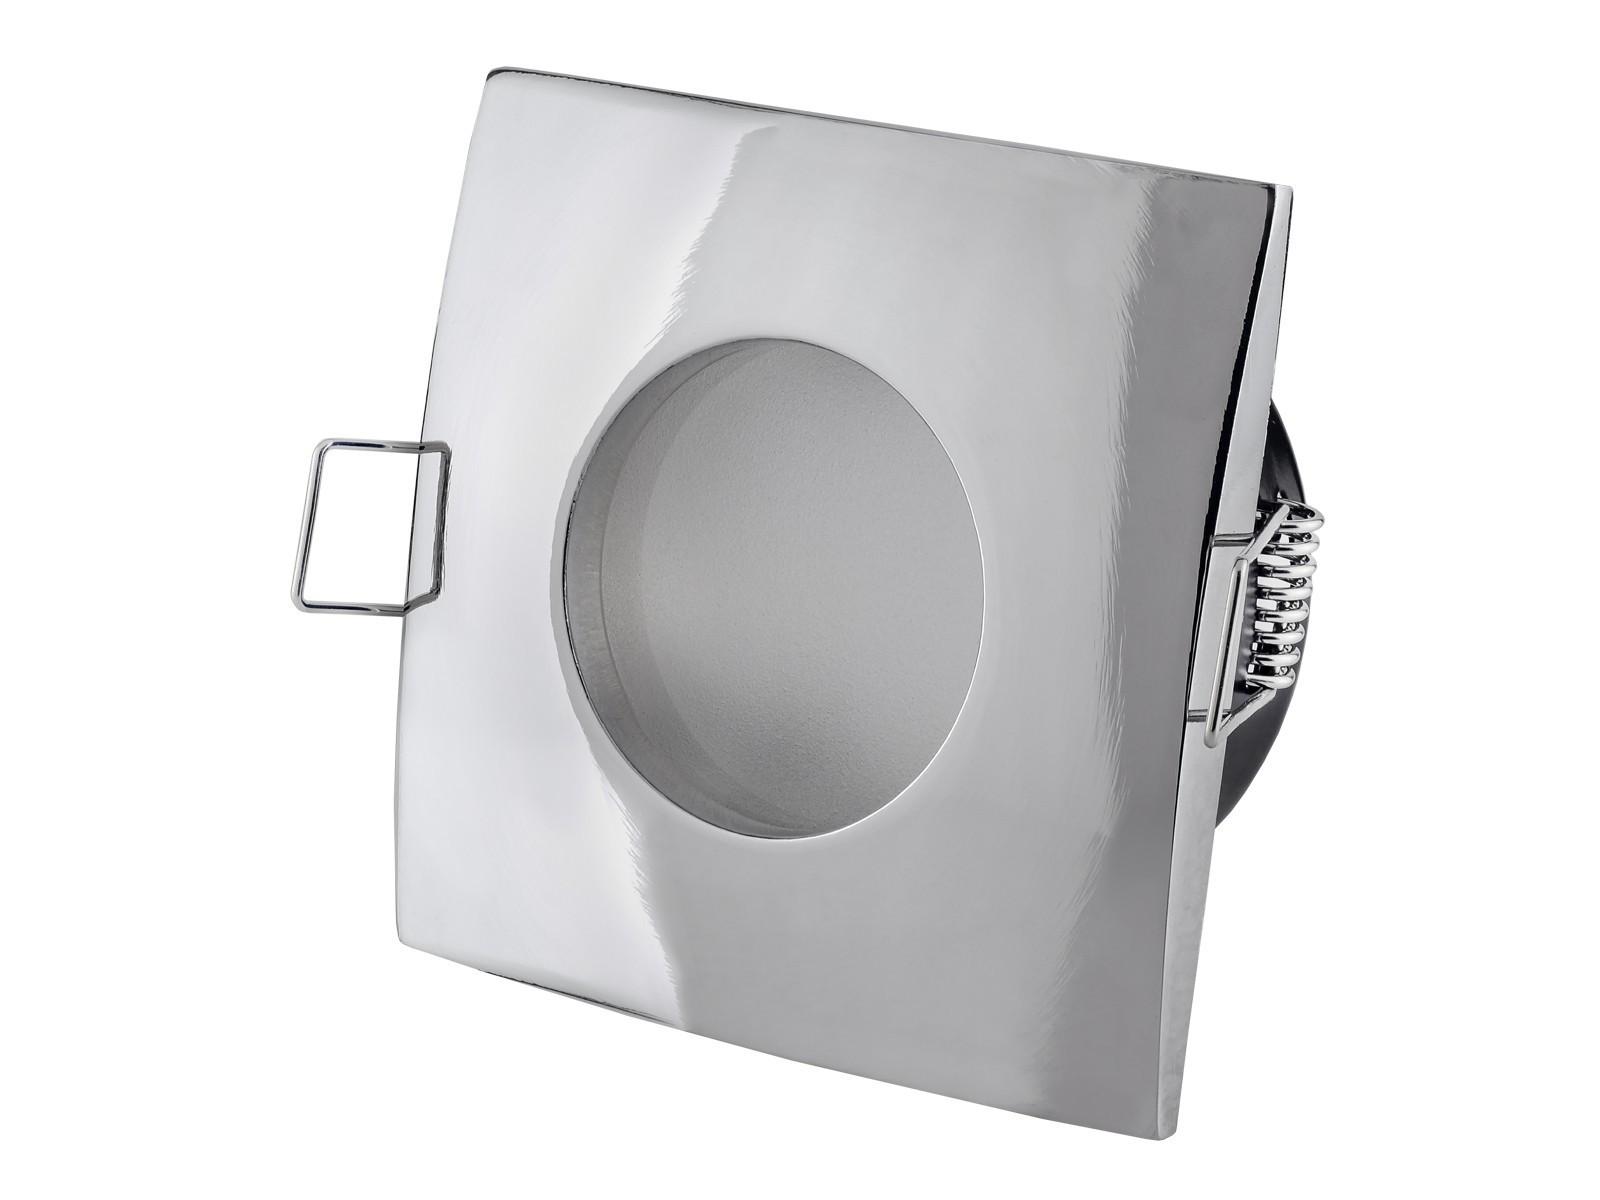 QW-1-chrom-shop-3-1600x1200 Elegantes Led Einbauleuchten 230v Dimmbar Dekorationen